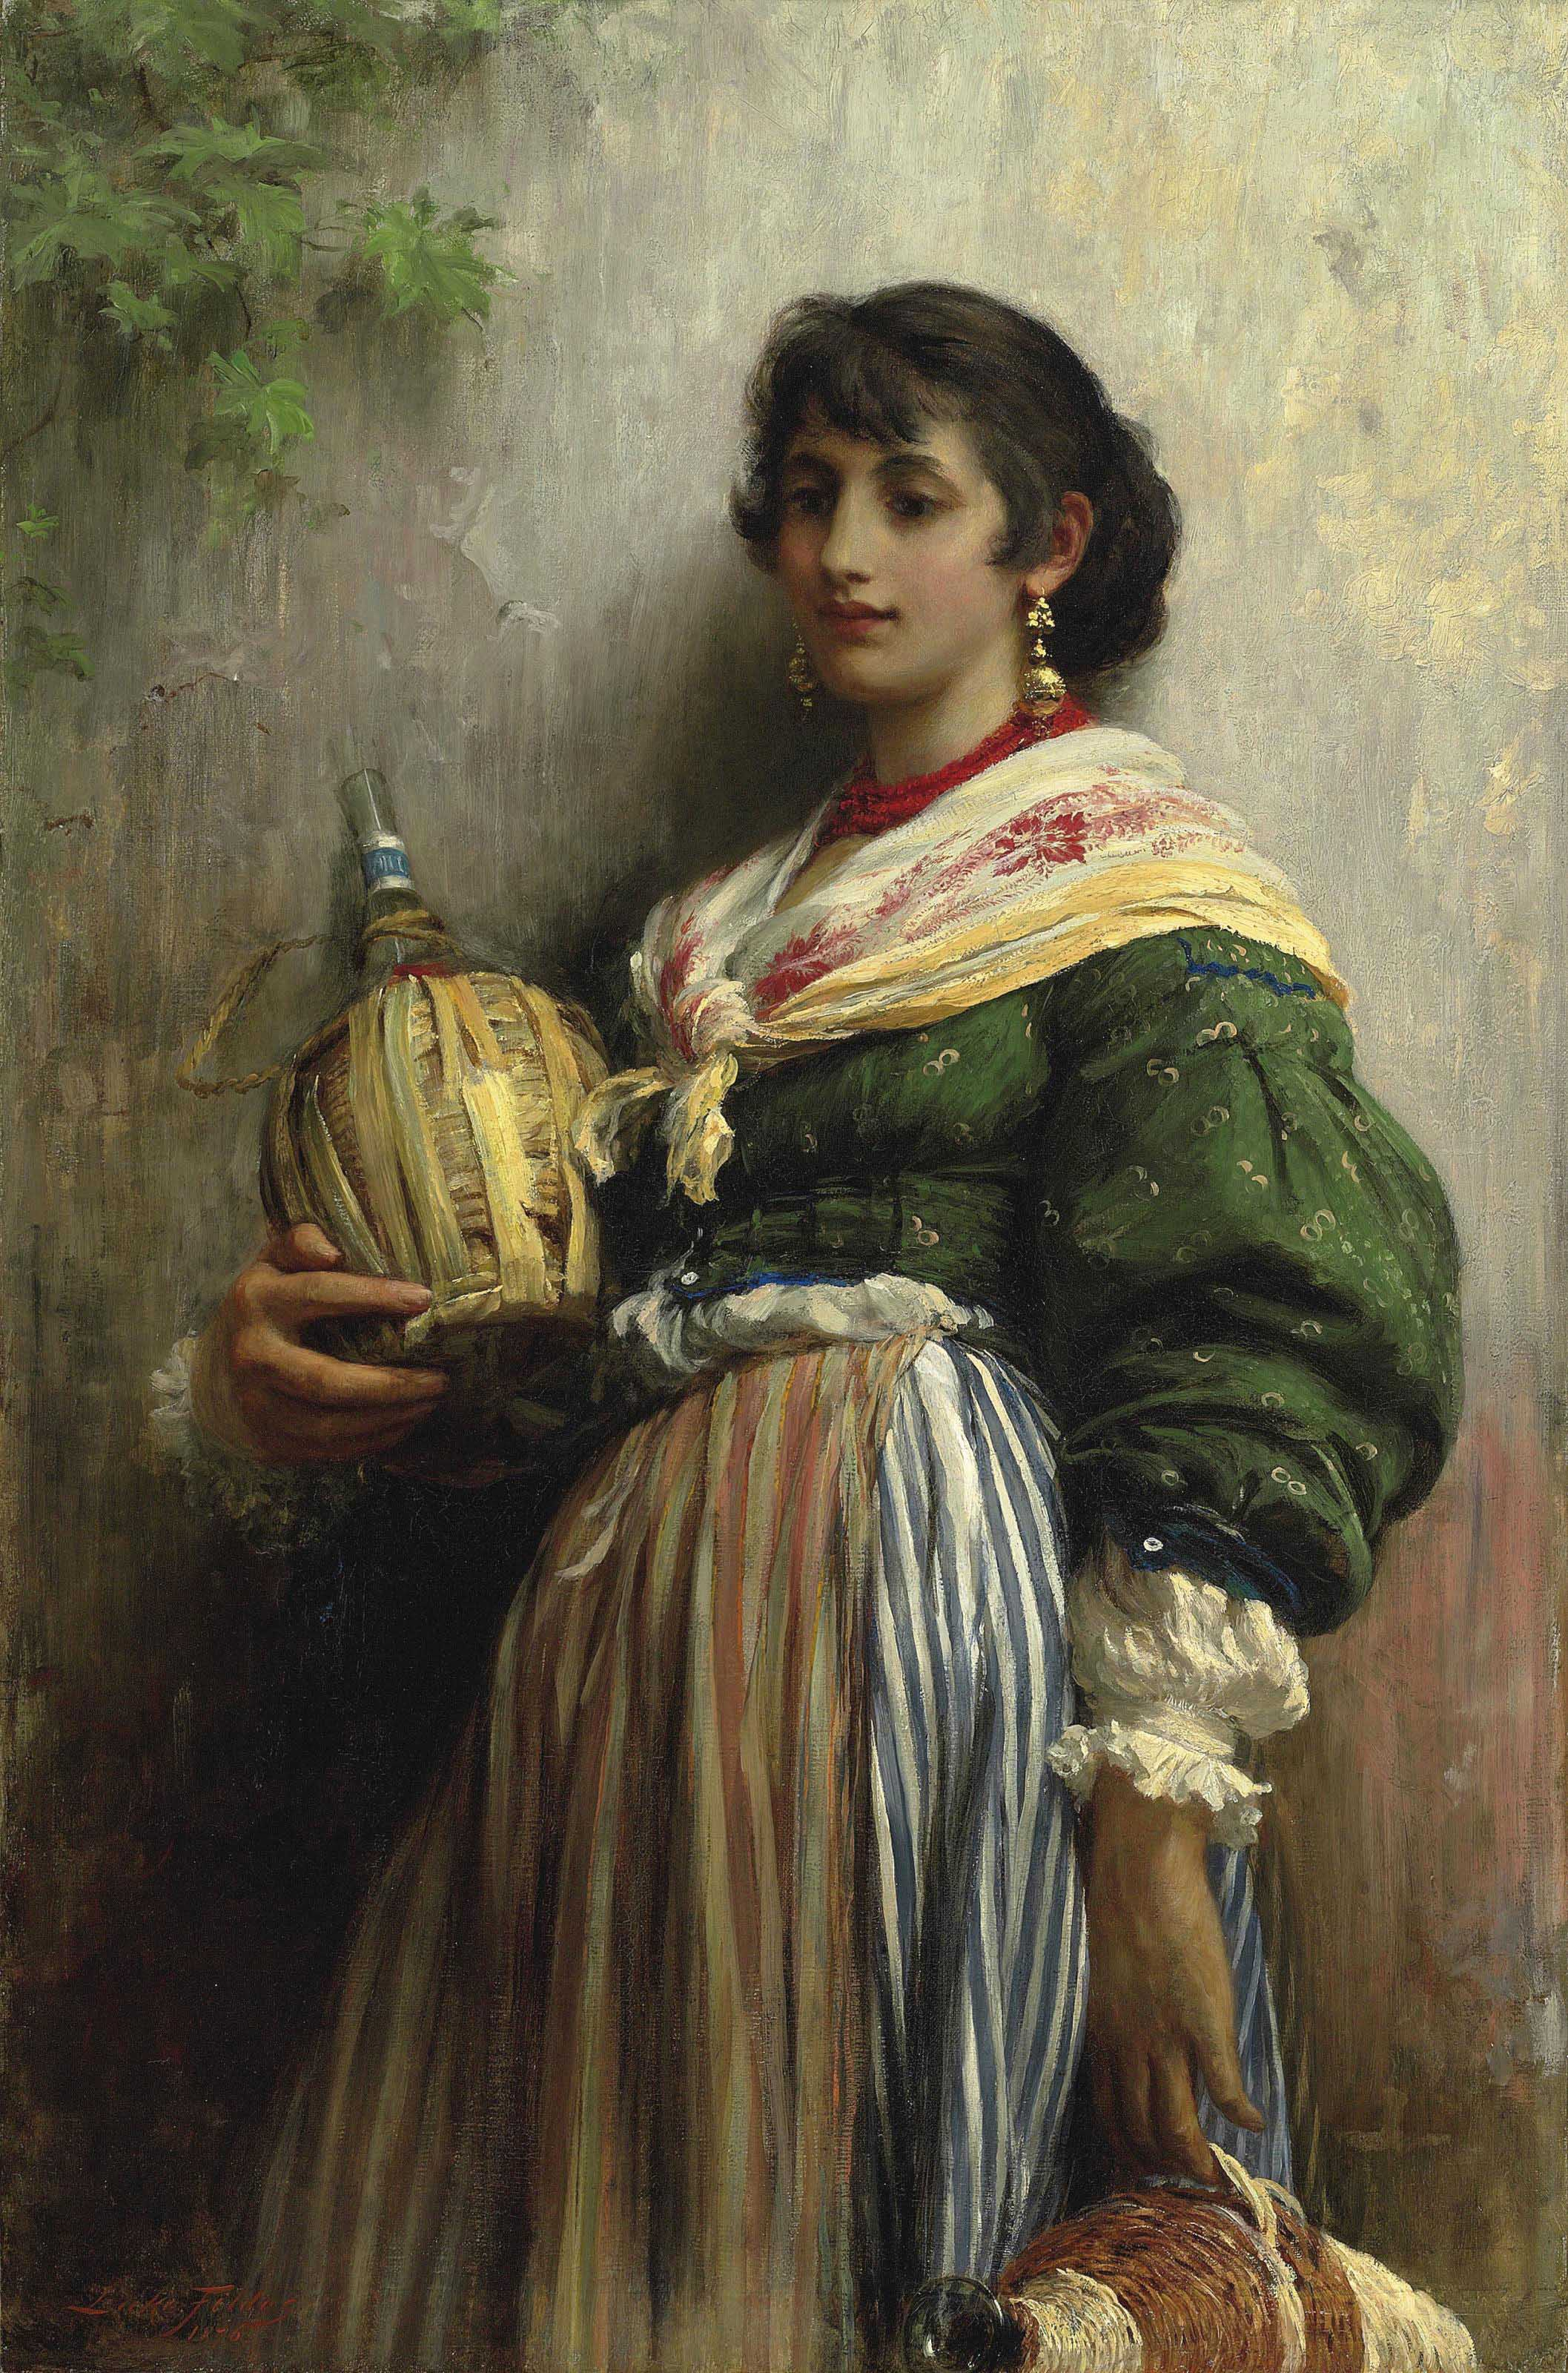 Rosa Siega